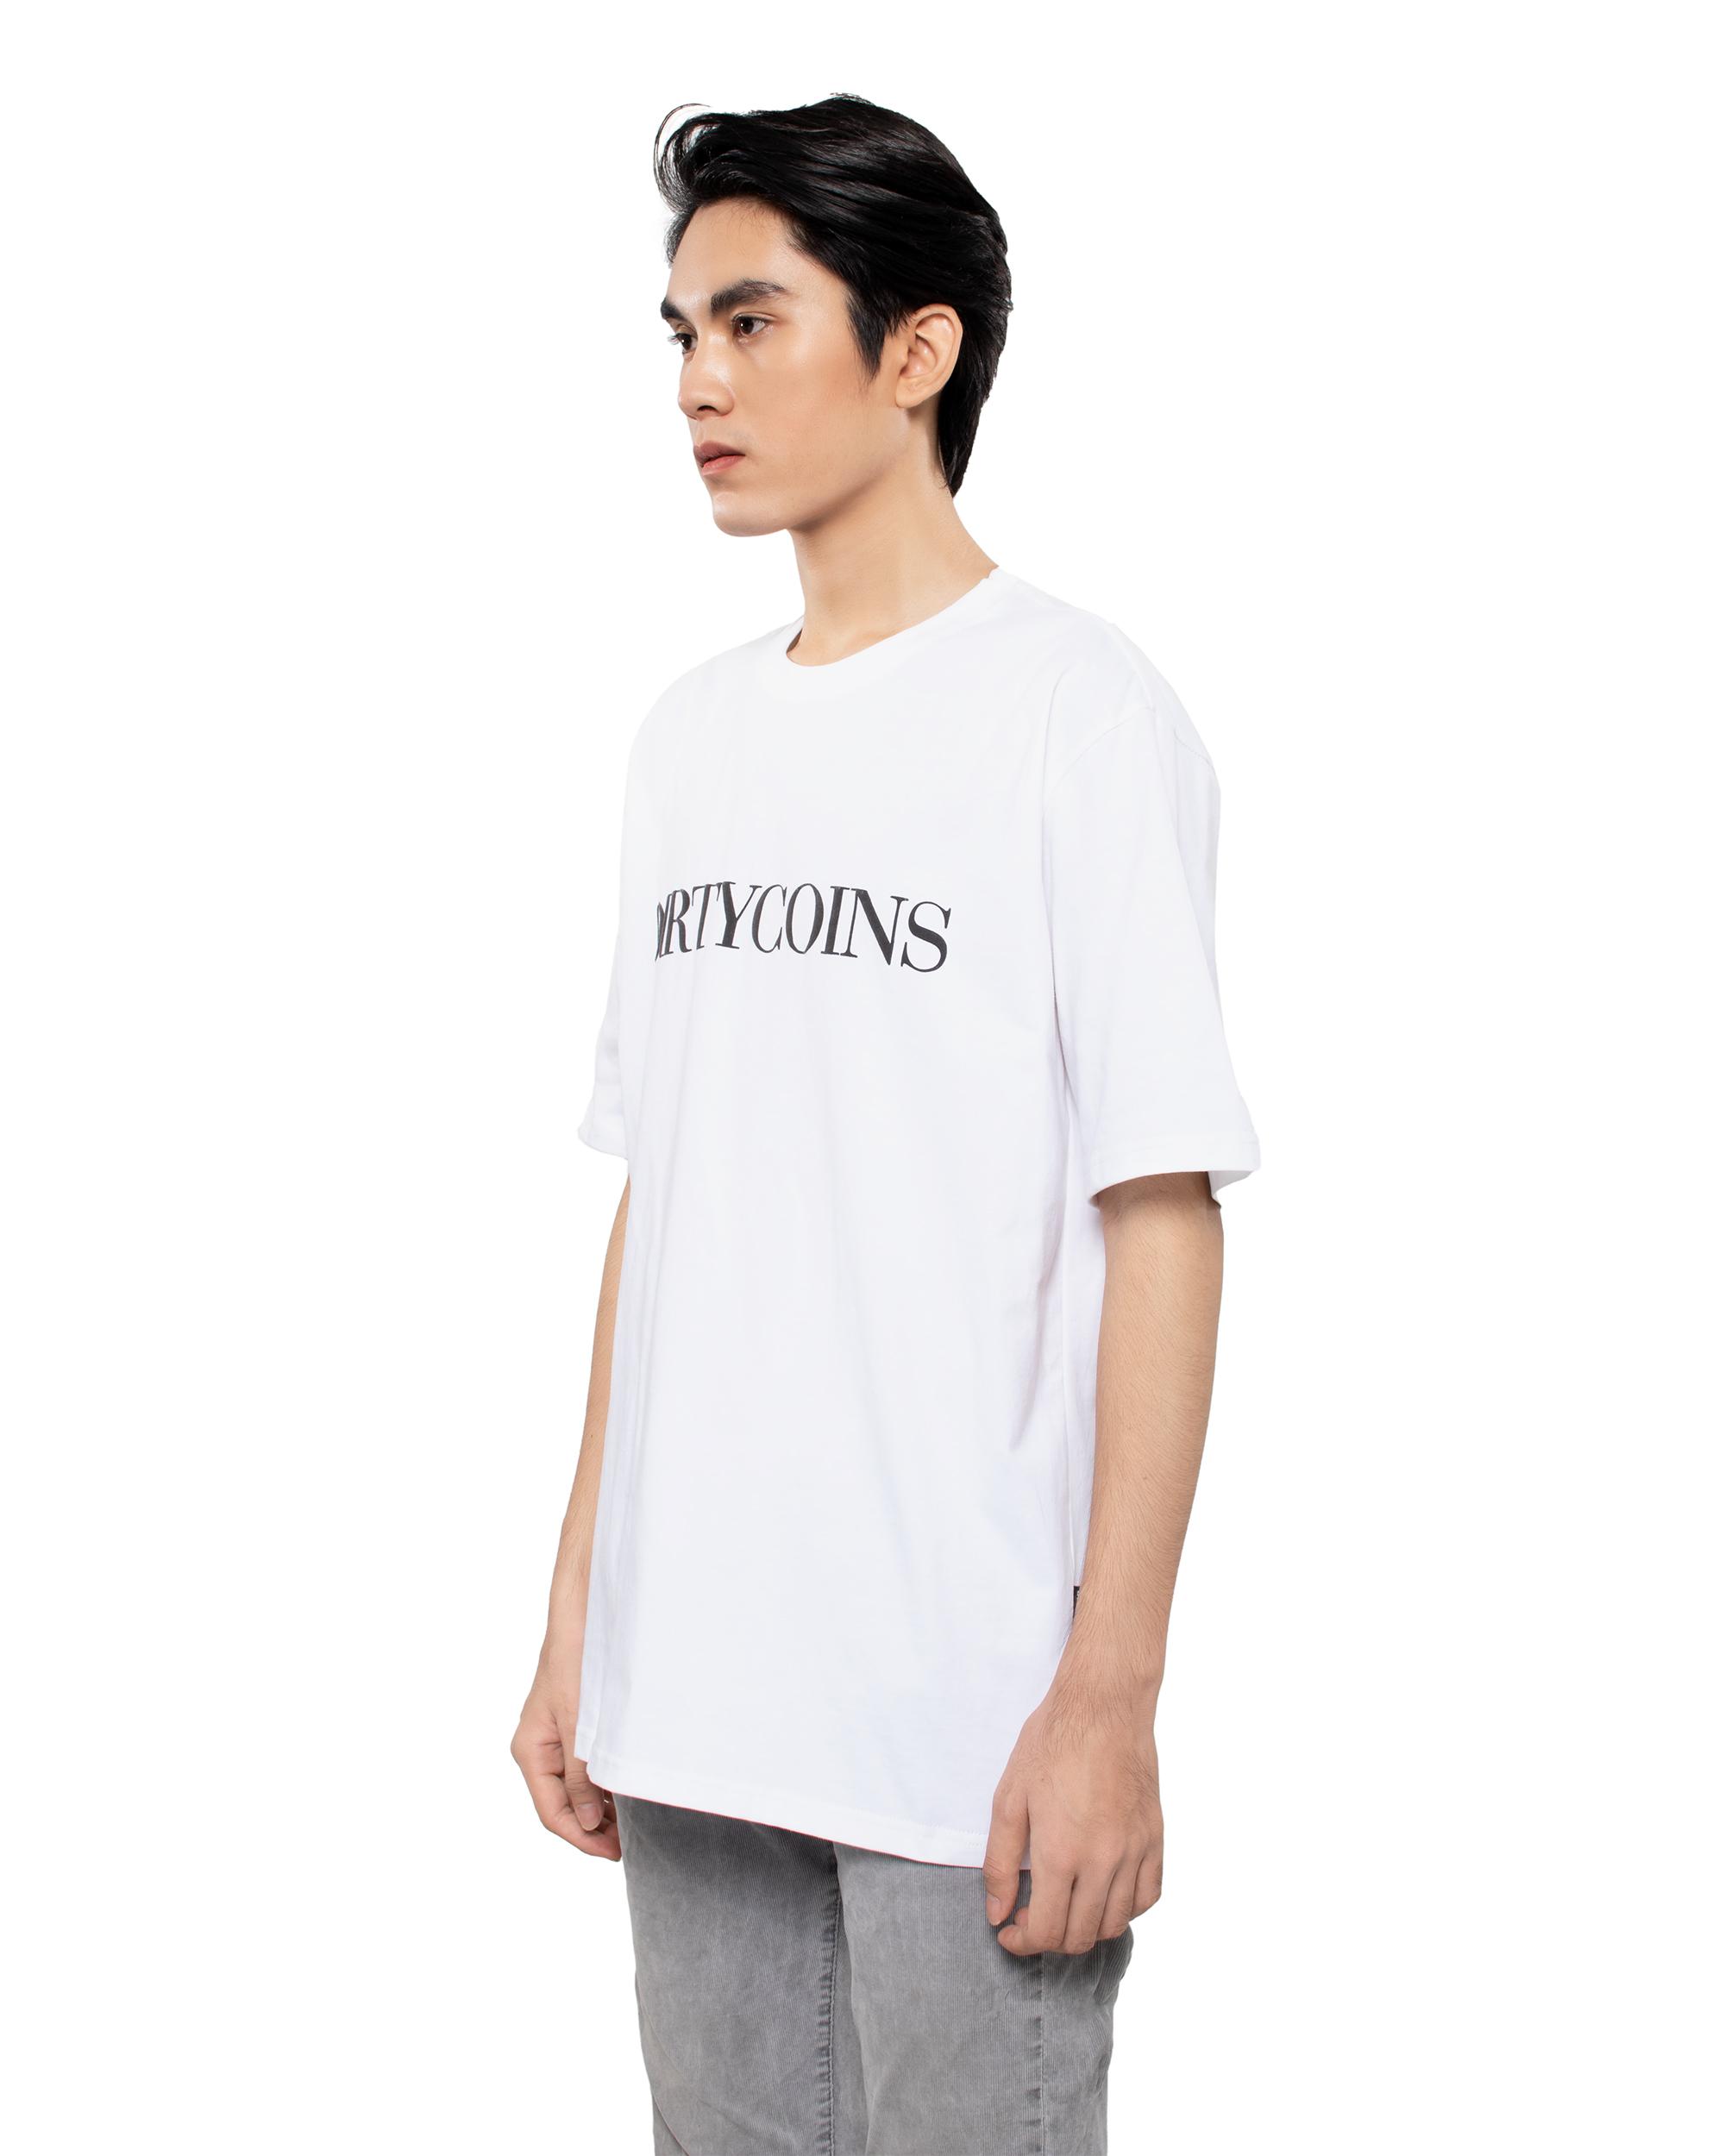 DirtyCoins Serif T-Shirt - White